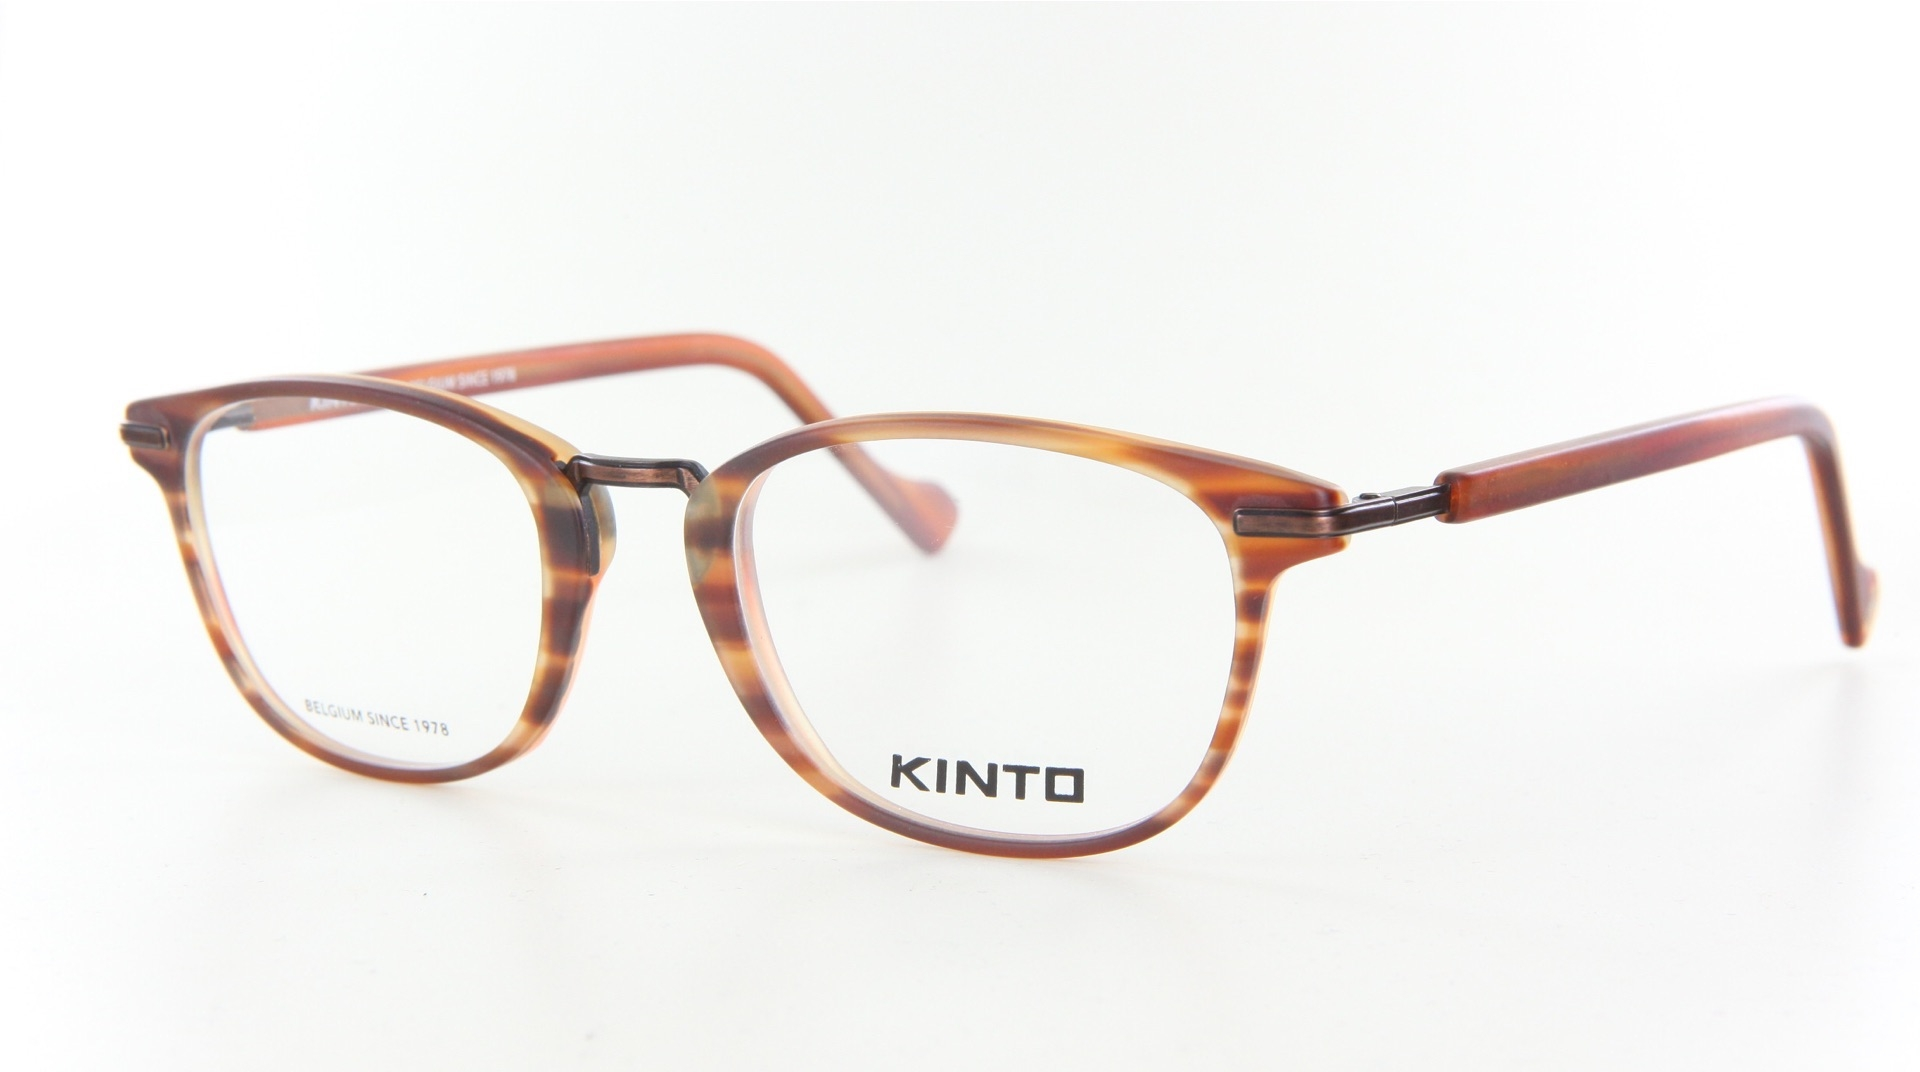 Kinto - ref: 75789